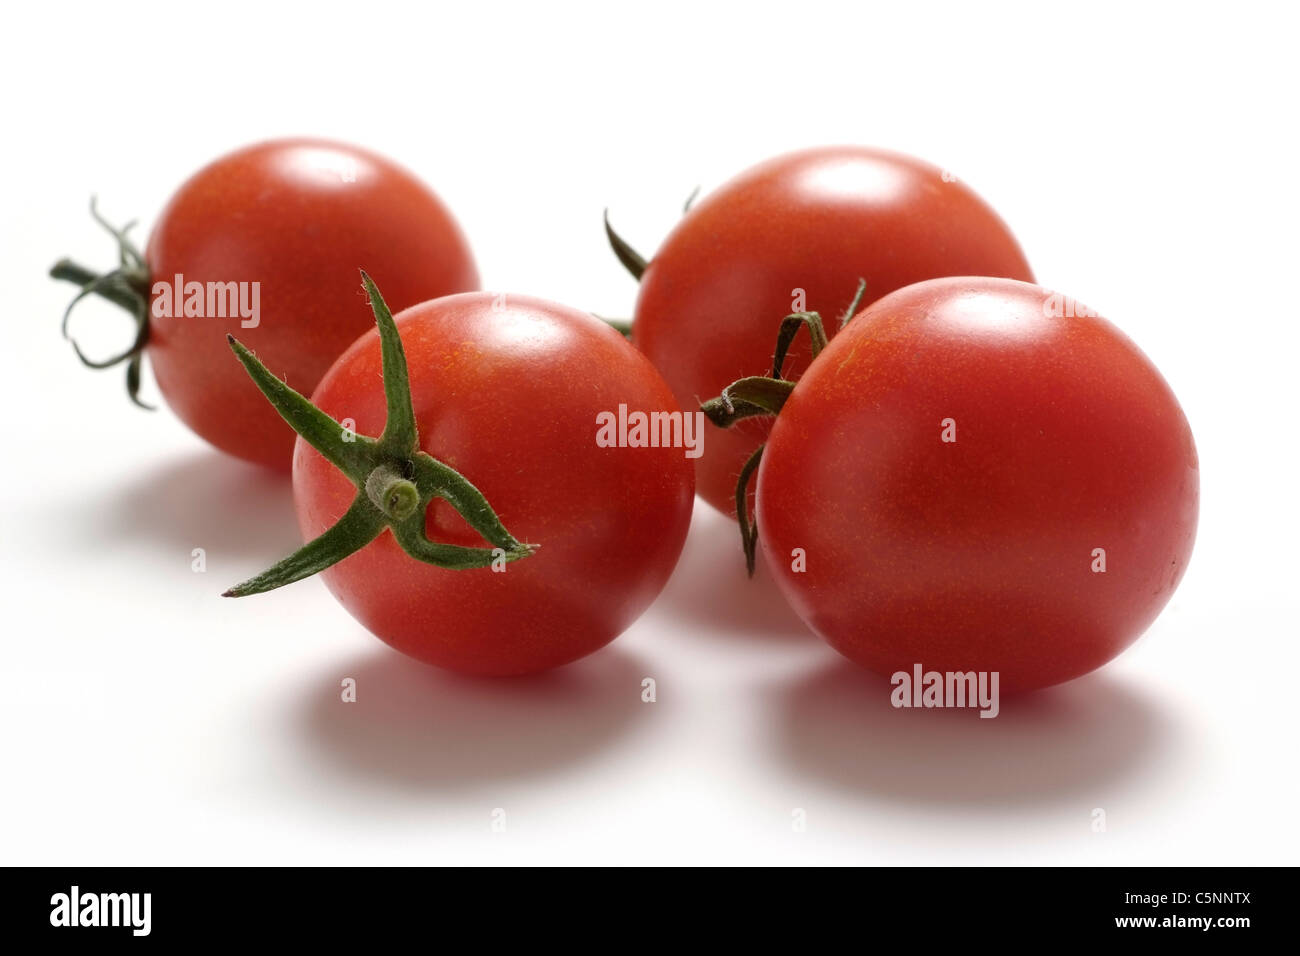 Tomato varieties: Dolce Vita - Stock Image